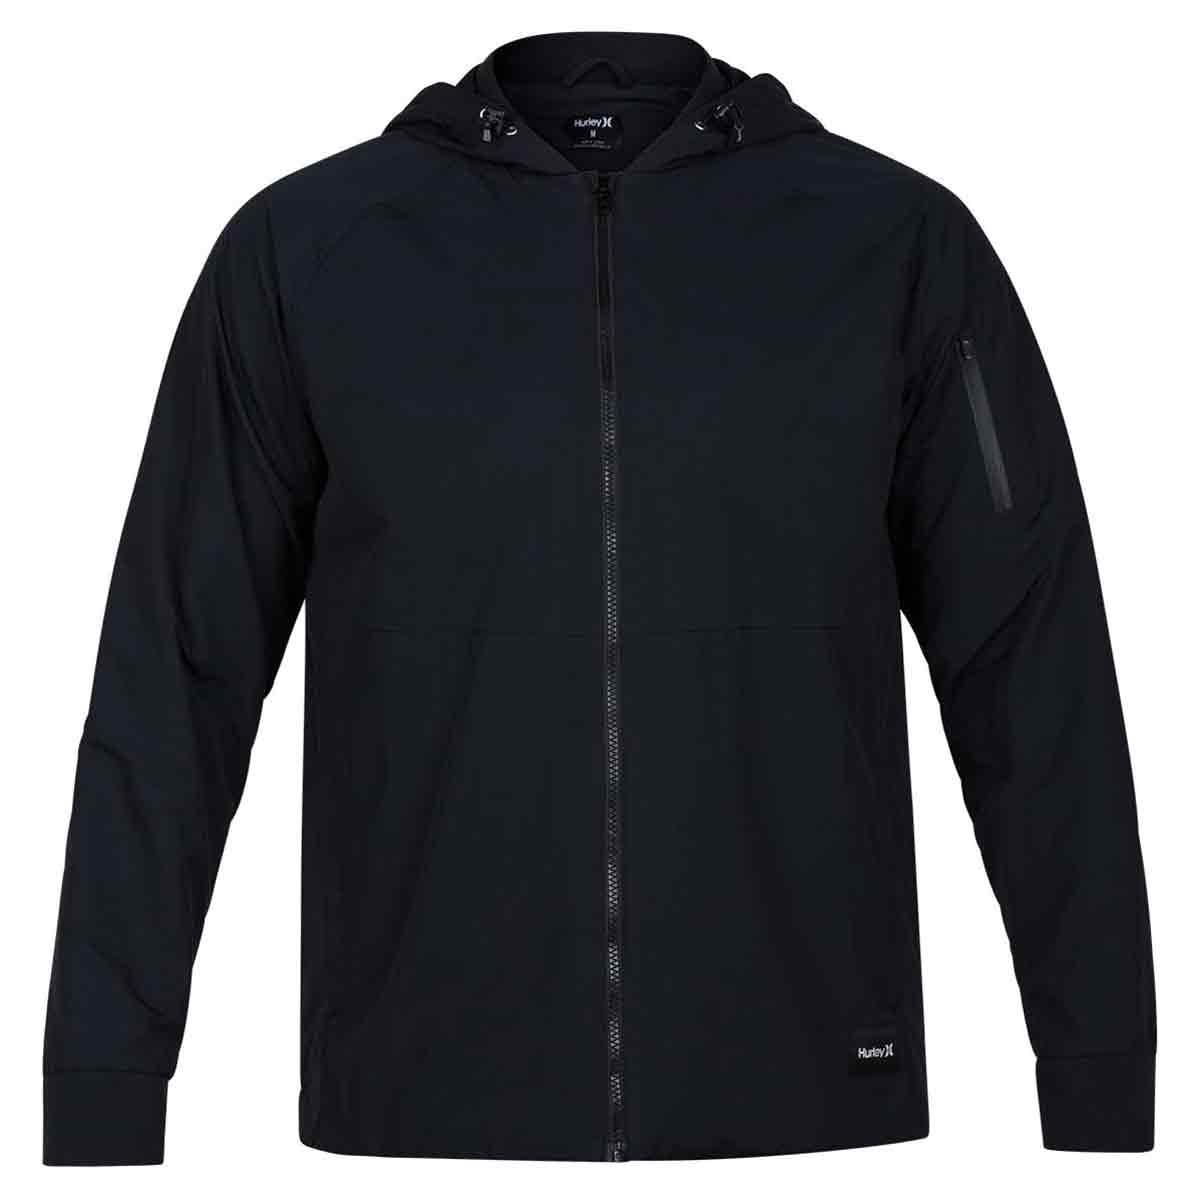 Hurley Guys' Garrison Hooded Jacket - Black, M